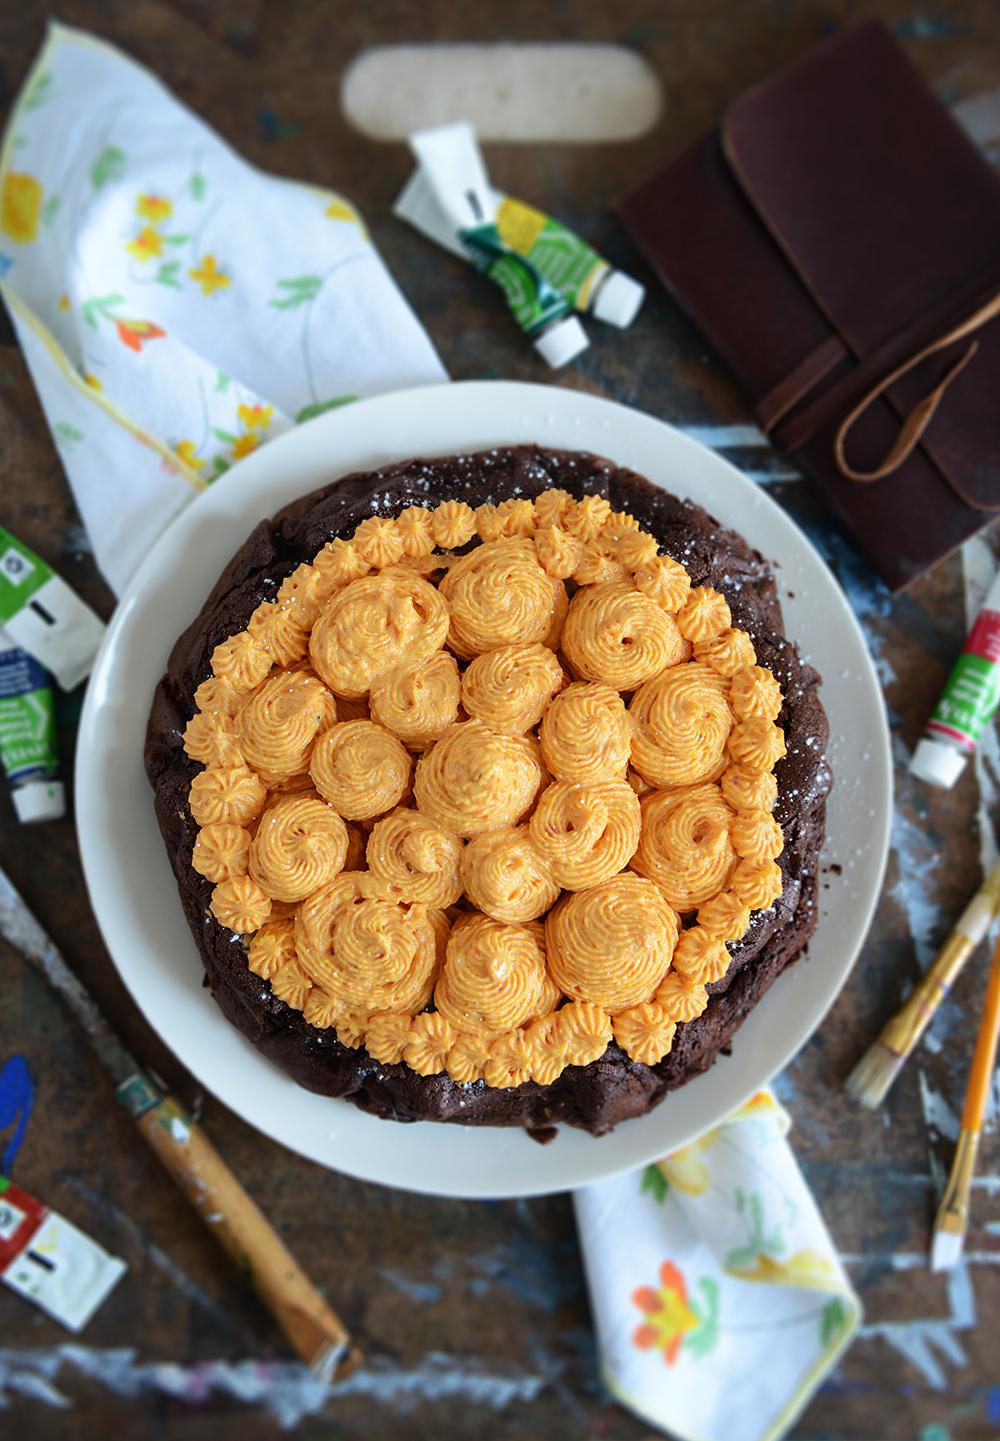 Flourless Dark Chocolate Torte with Roasted Carrot Buttercream